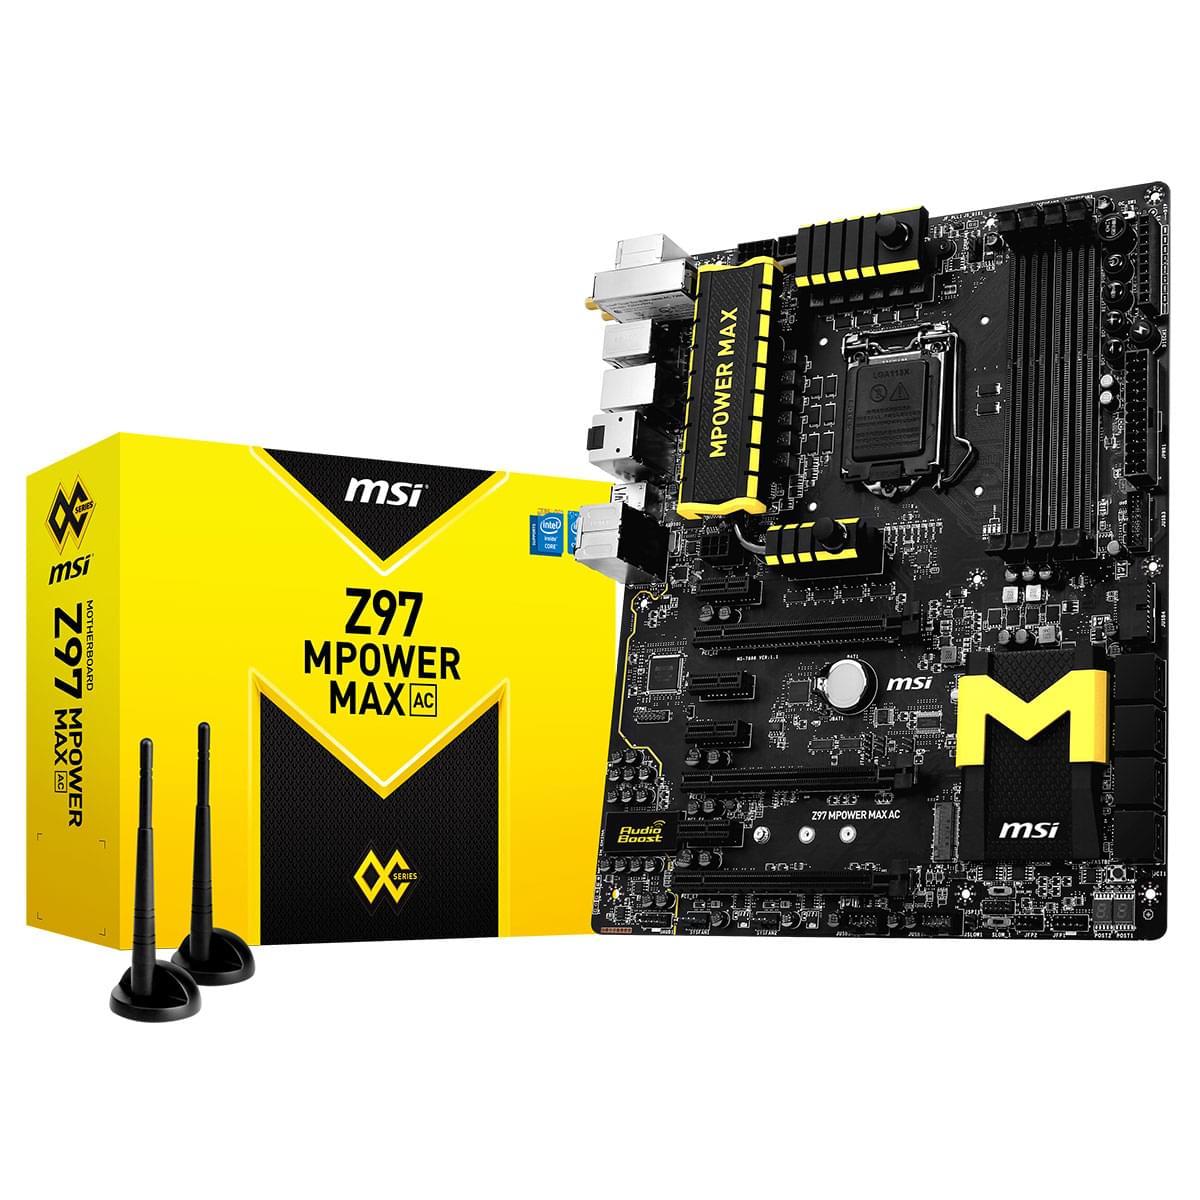 MSI Z97 MPOWER ATX DDR3 - Carte mère MSI - Cybertek.fr - 0